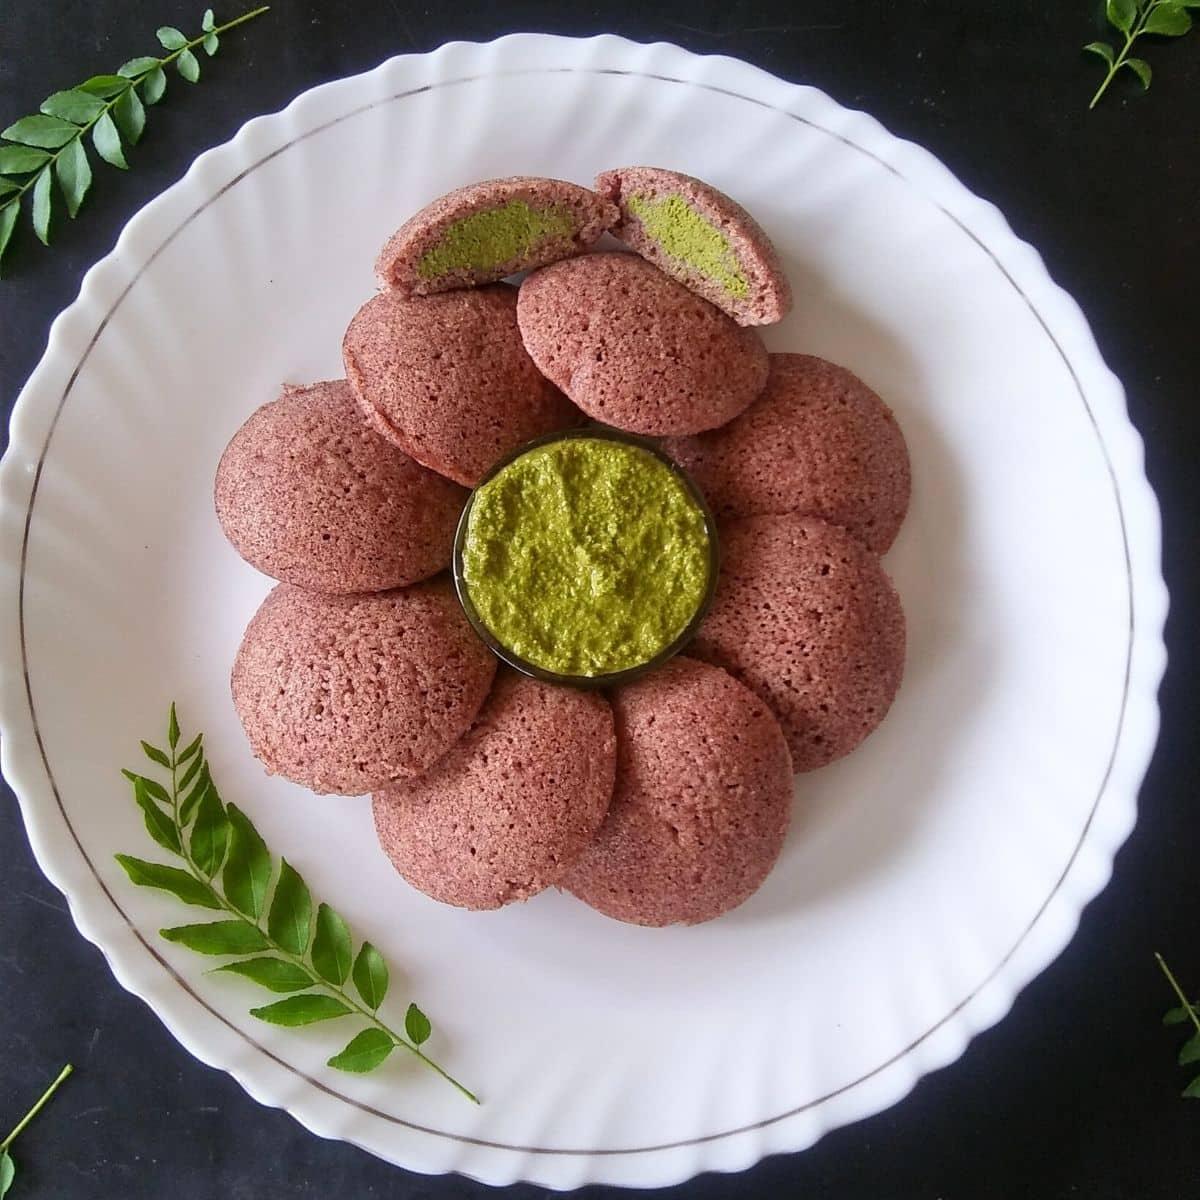 Chutney Stuffed Ragi Idli